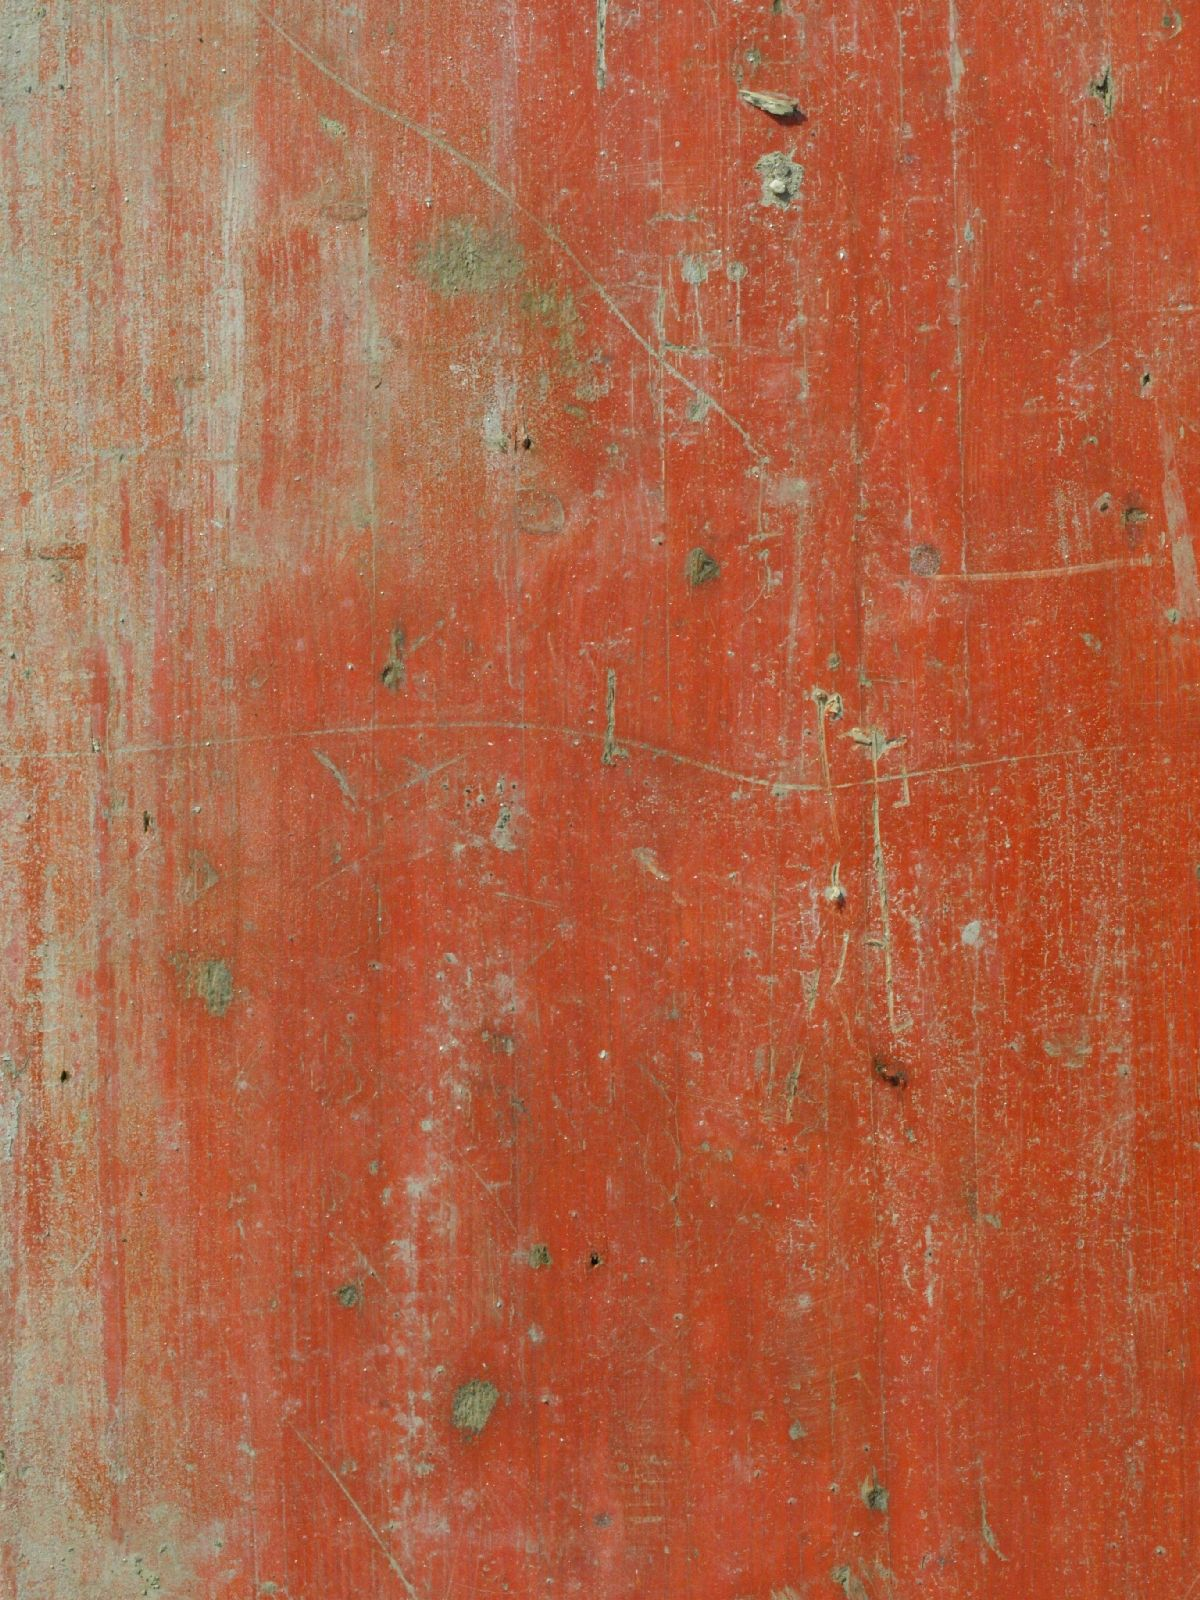 Wood_Texture_A_P3151340